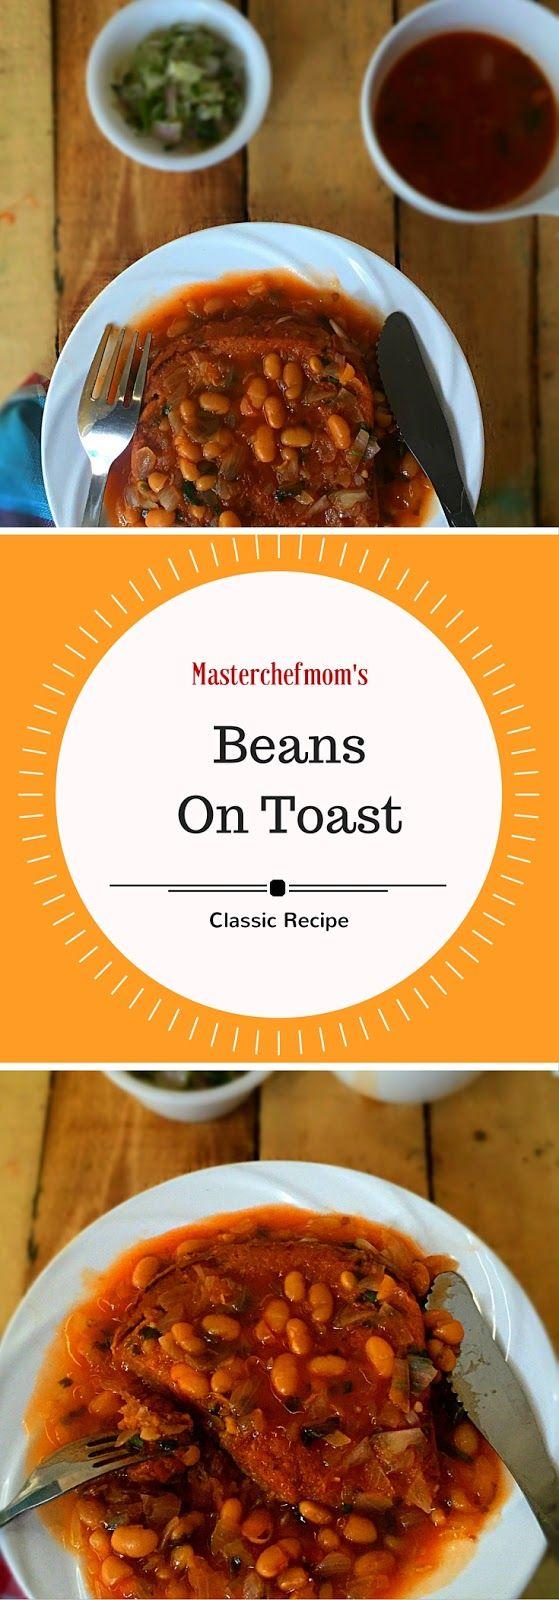 MASTERCHEFMOM: Beans On Toast | Restaurant Style Baked Beans On Toast | How to…